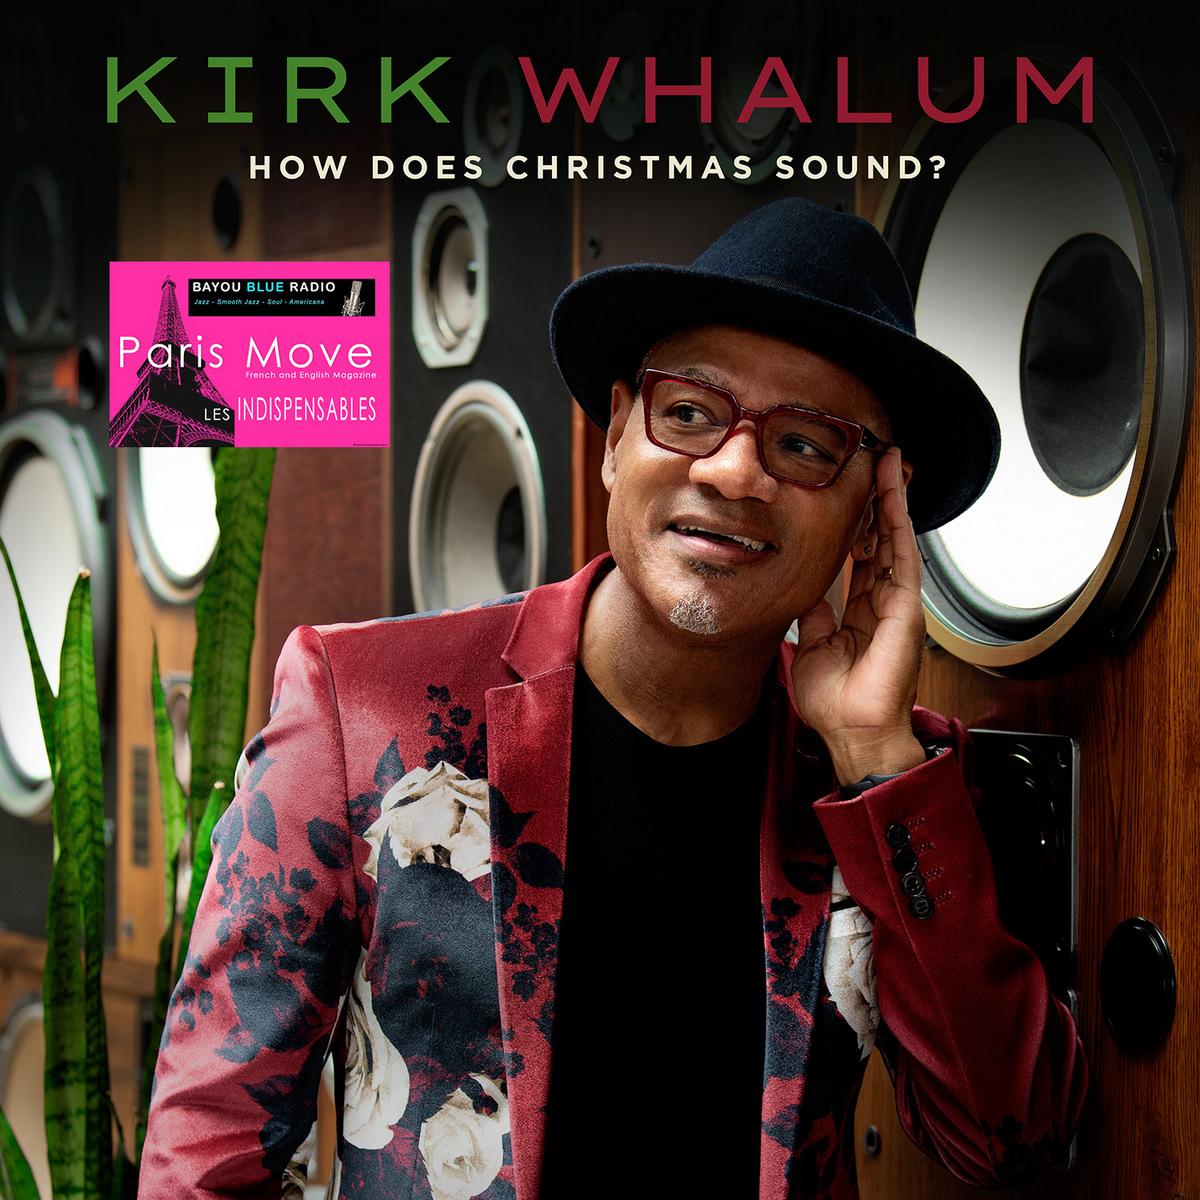 Kirk Whalum – How Does Christmas Sound?